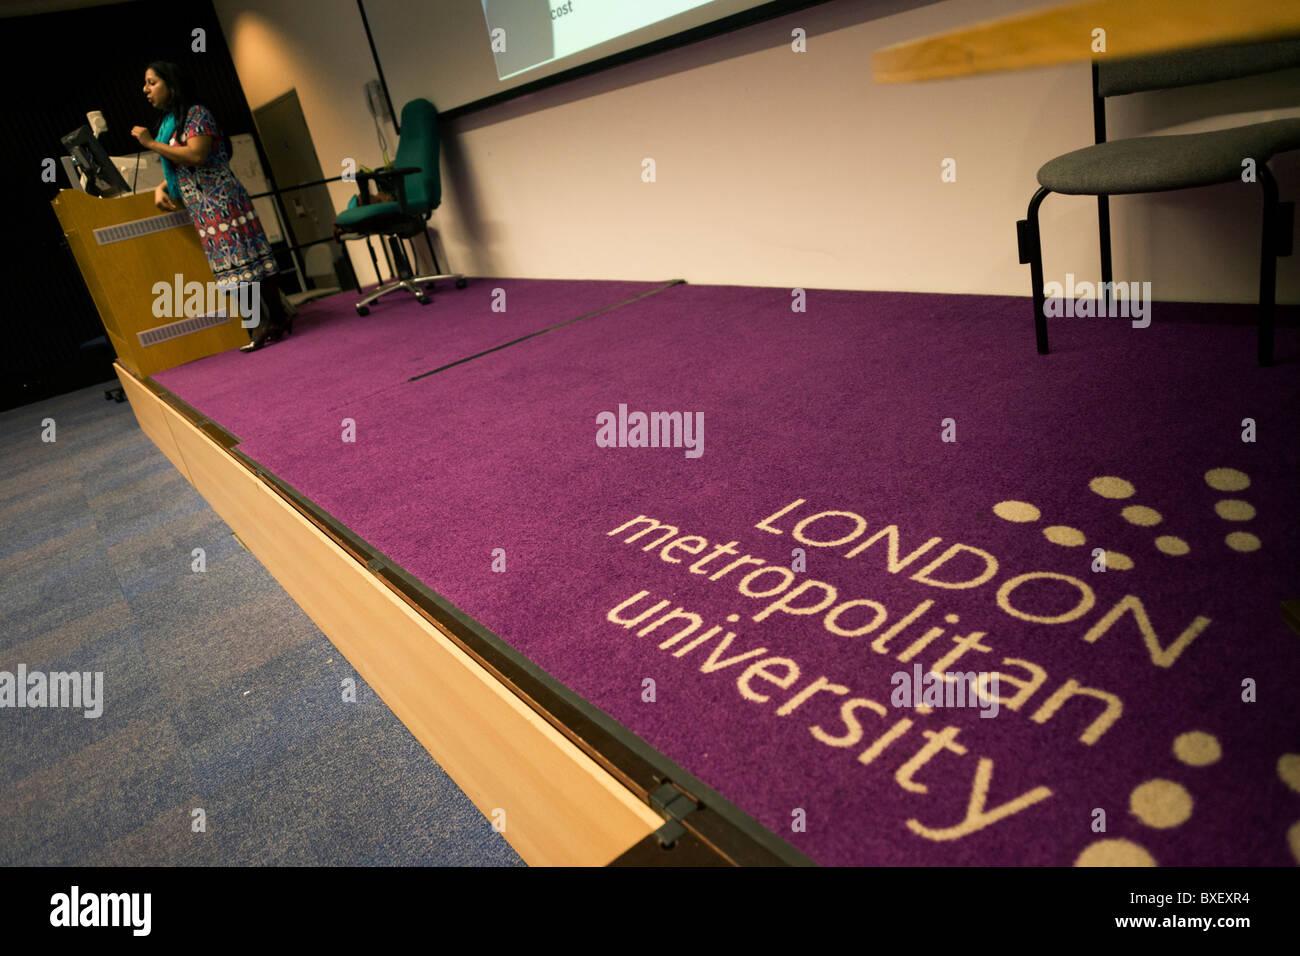 Purple corporate logo on lecture theatre carpet of London Metropolitan University's Holloway Road. - Stock Image